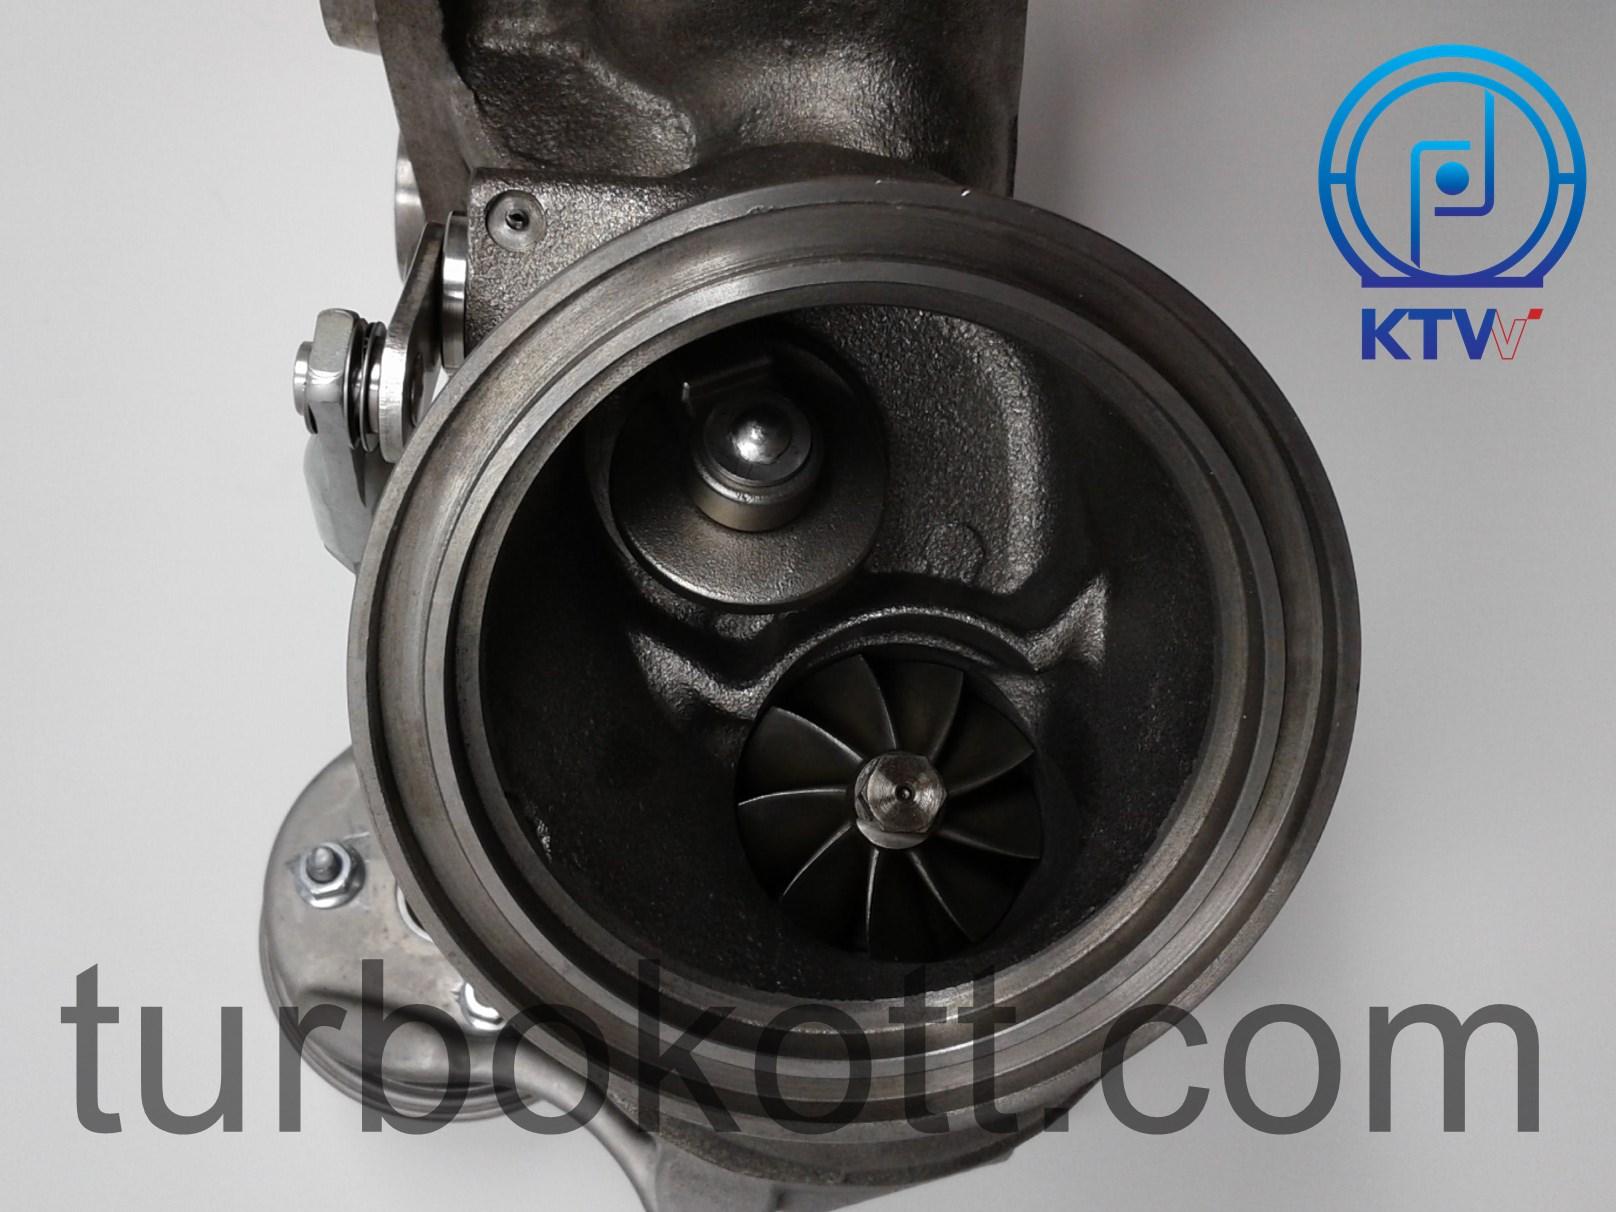 KTB003 N54 upgraded twin turbochargers